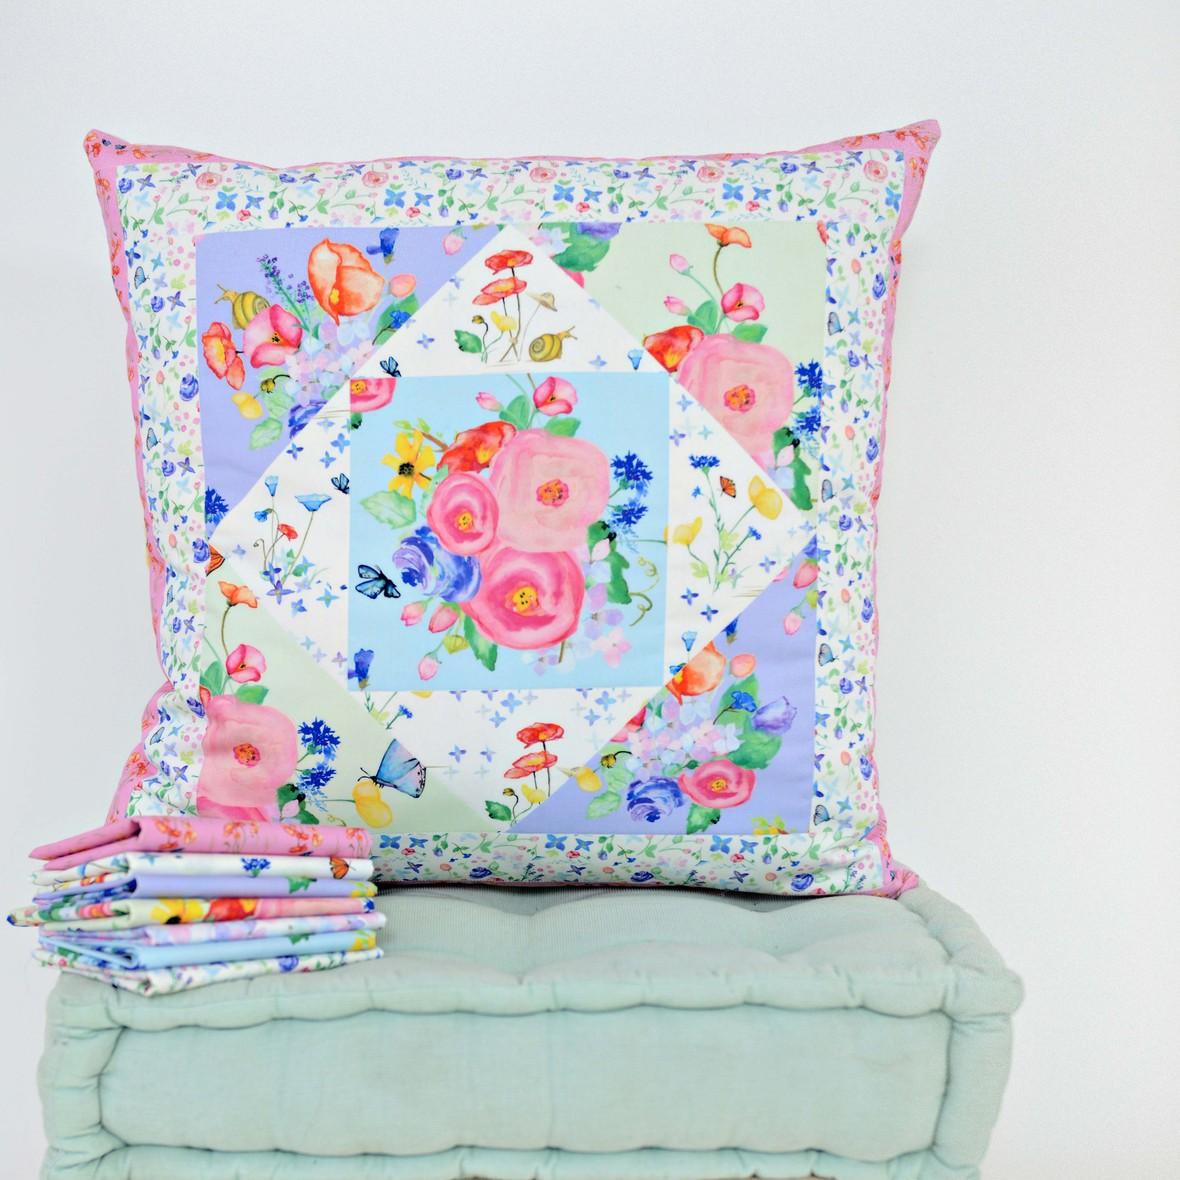 Primavera Fabric Pillow